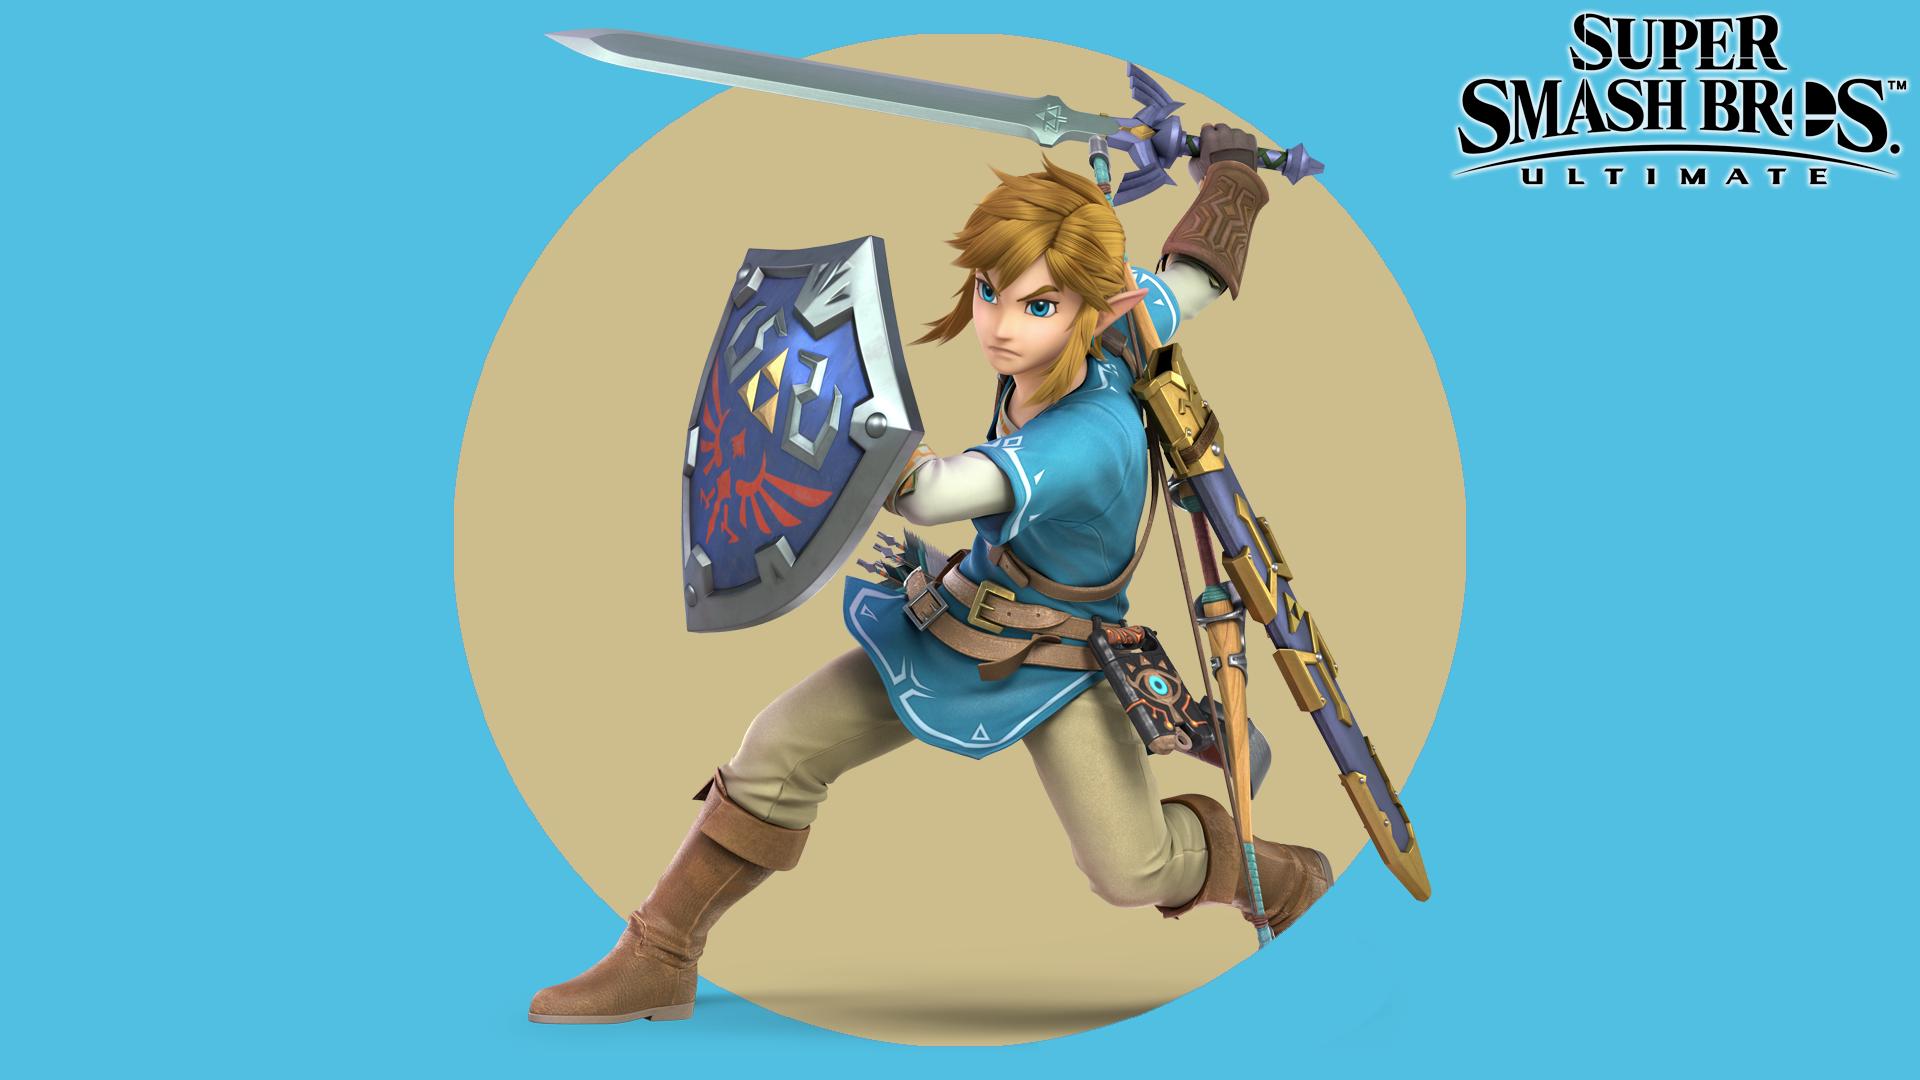 Super Smash Bros Ultimate Link Wallpaper Hd Wallpaper